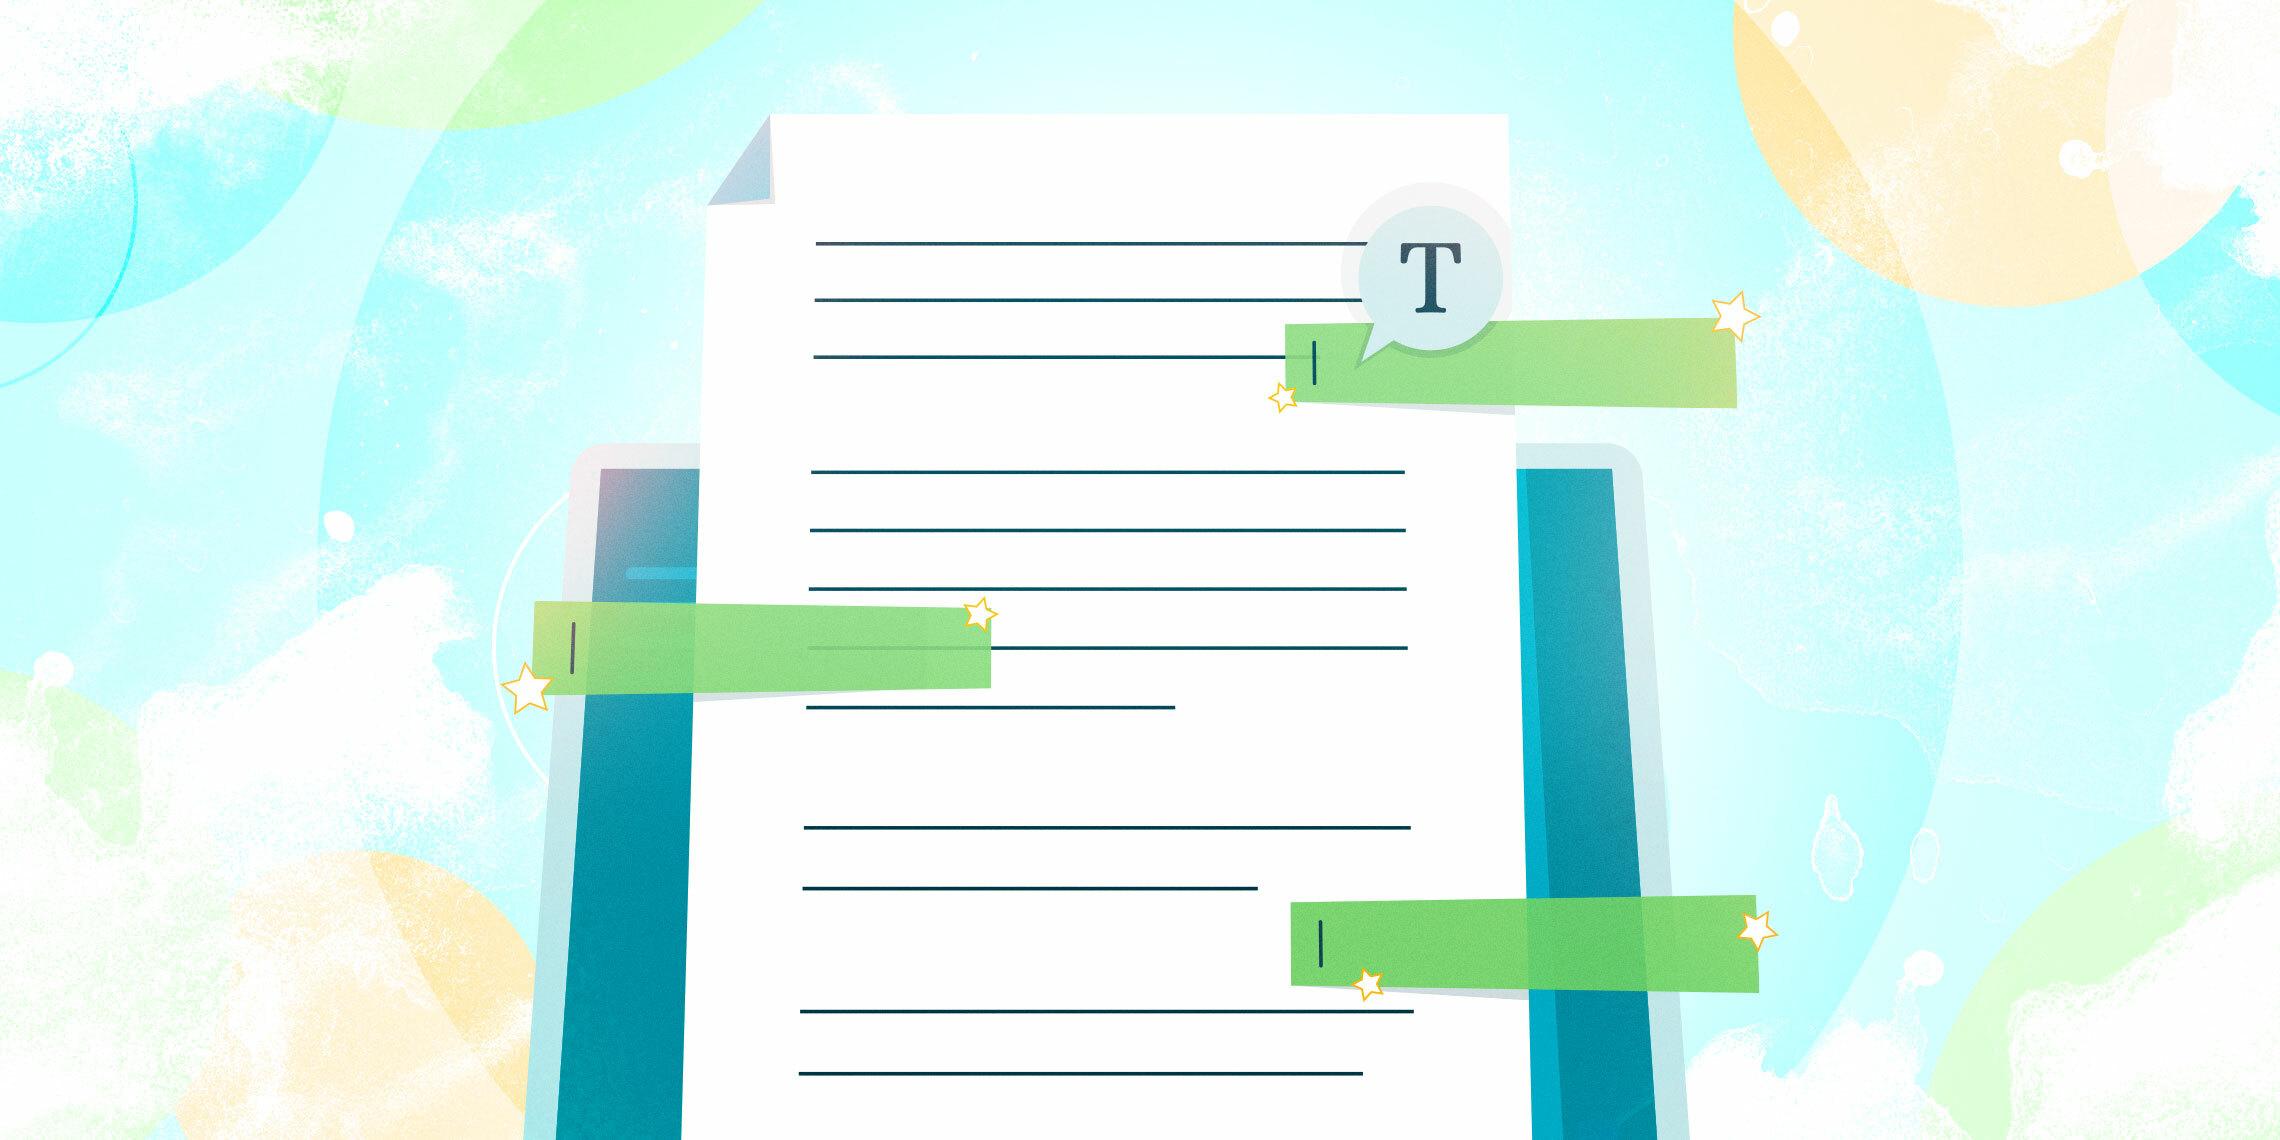 proposify client input forms